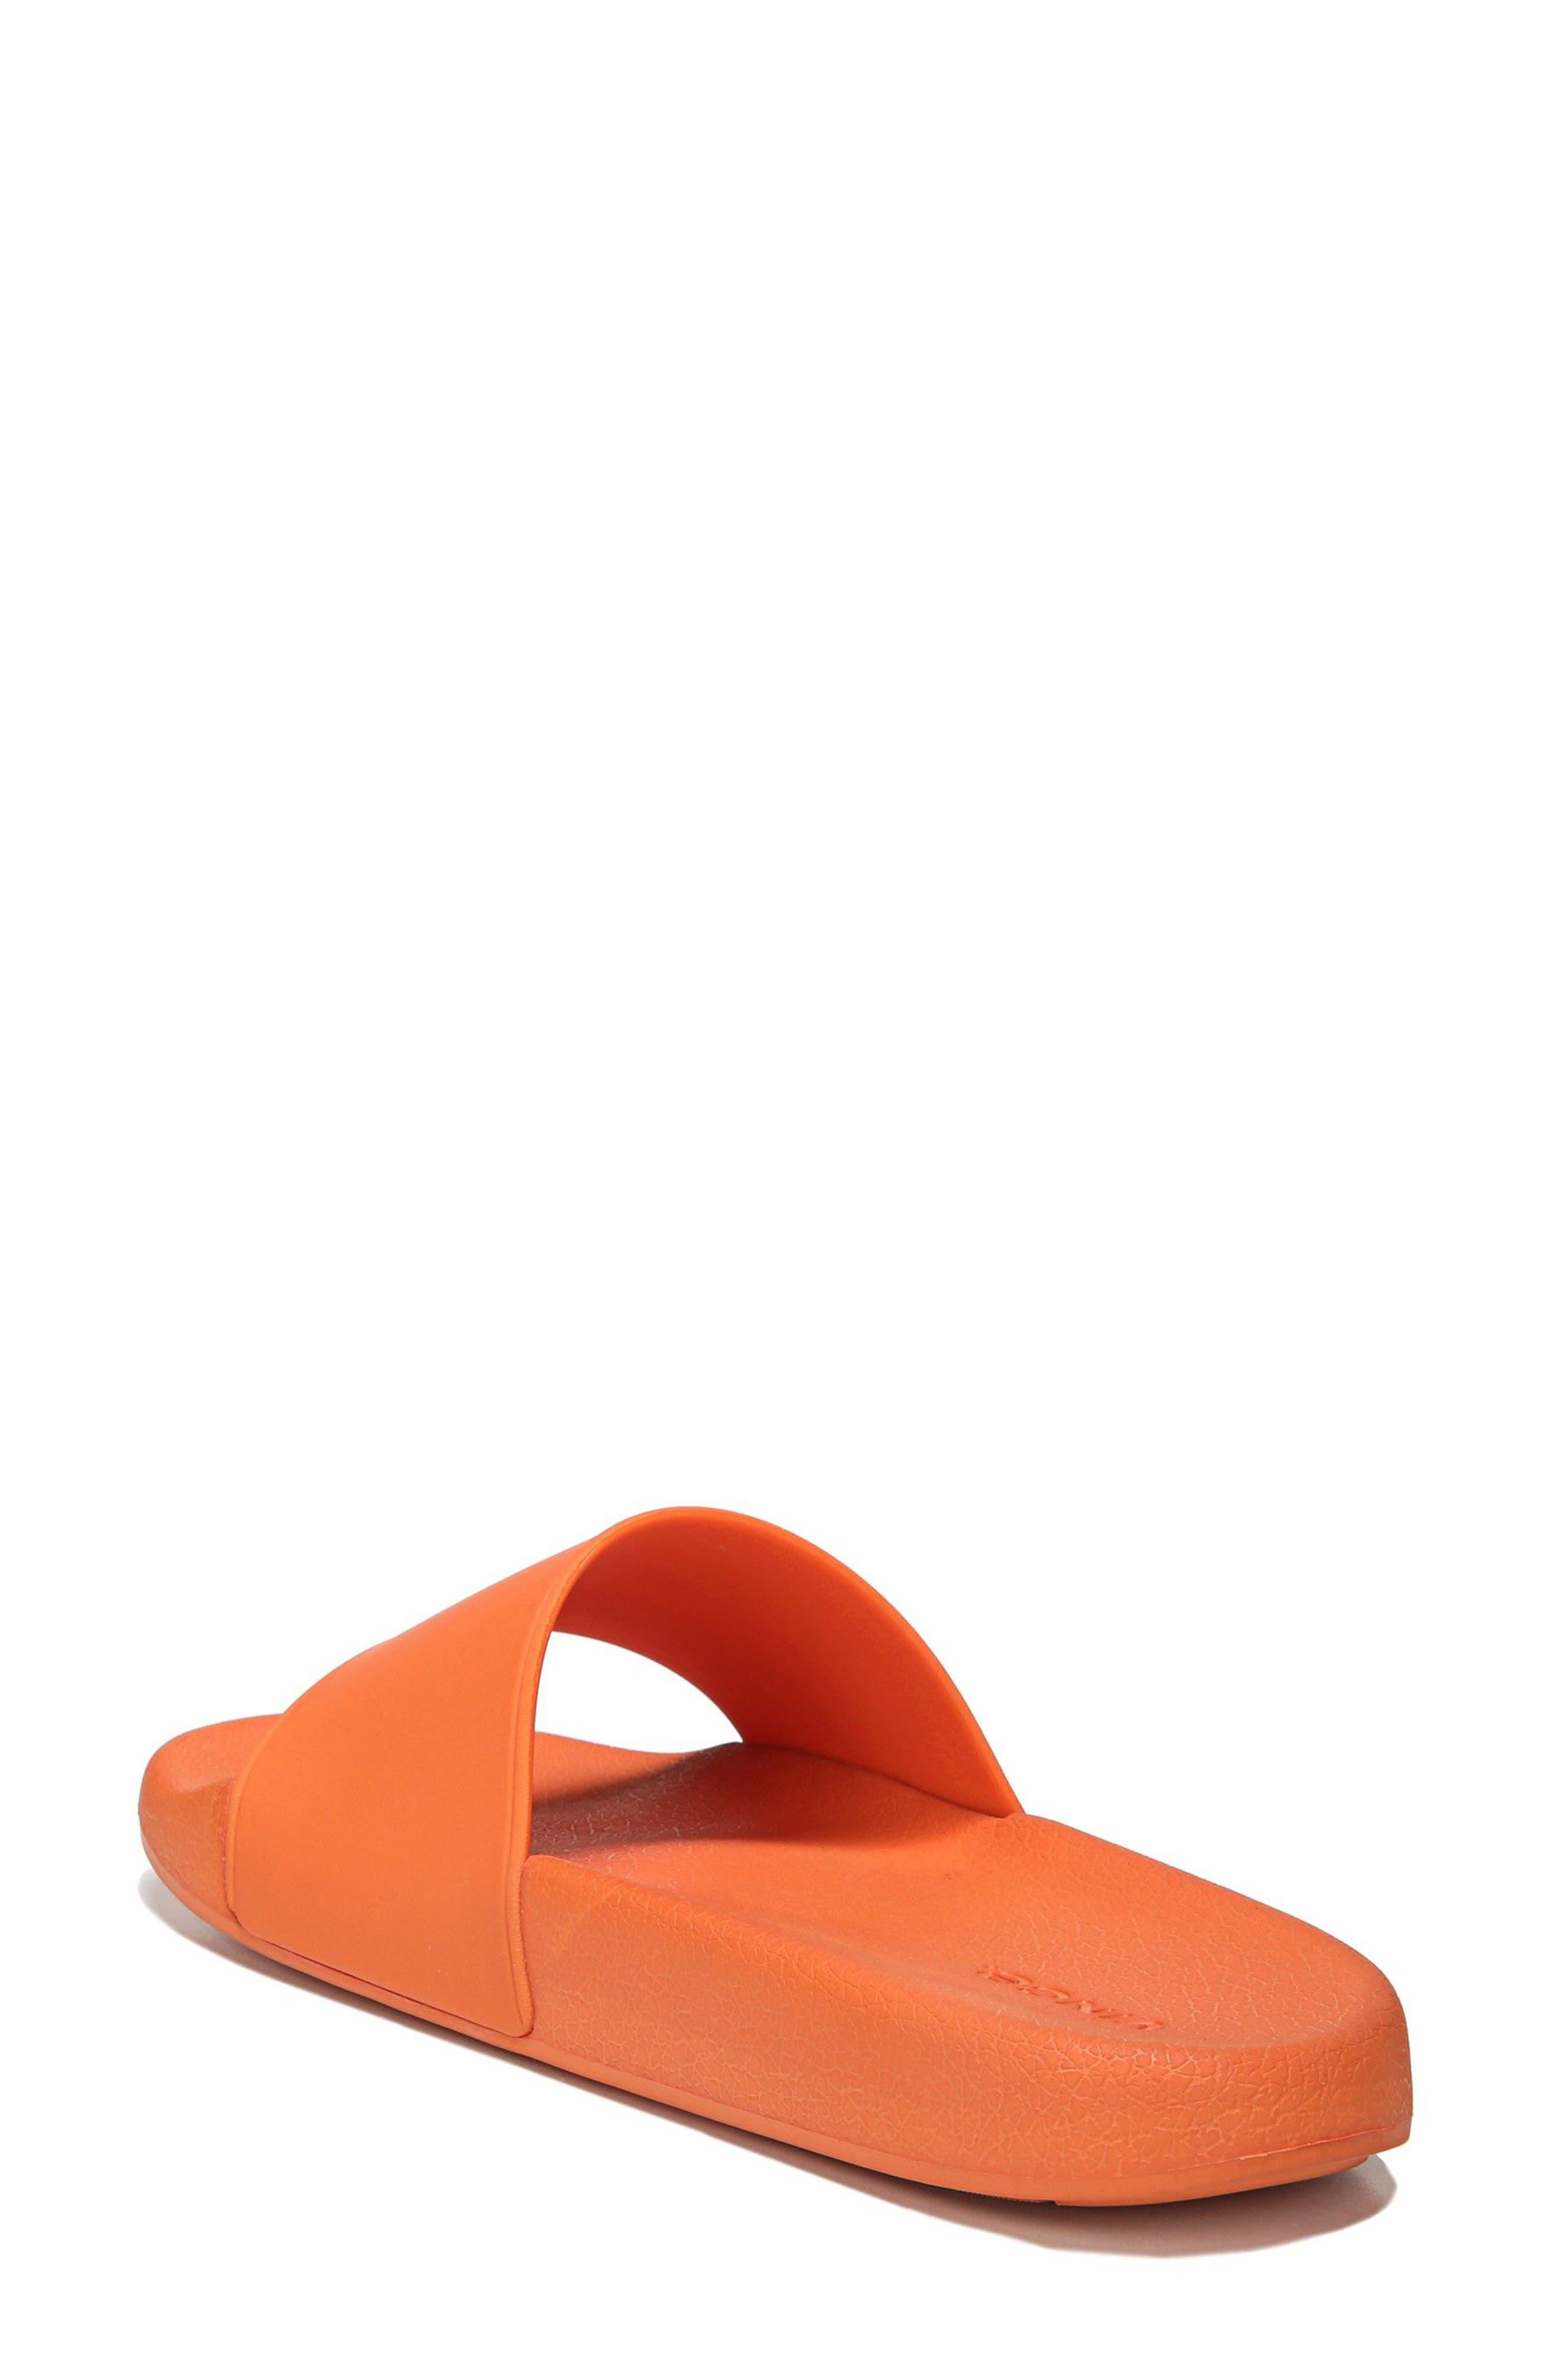 Westcoast Slide Sandal,                             Alternate thumbnail 19, color,